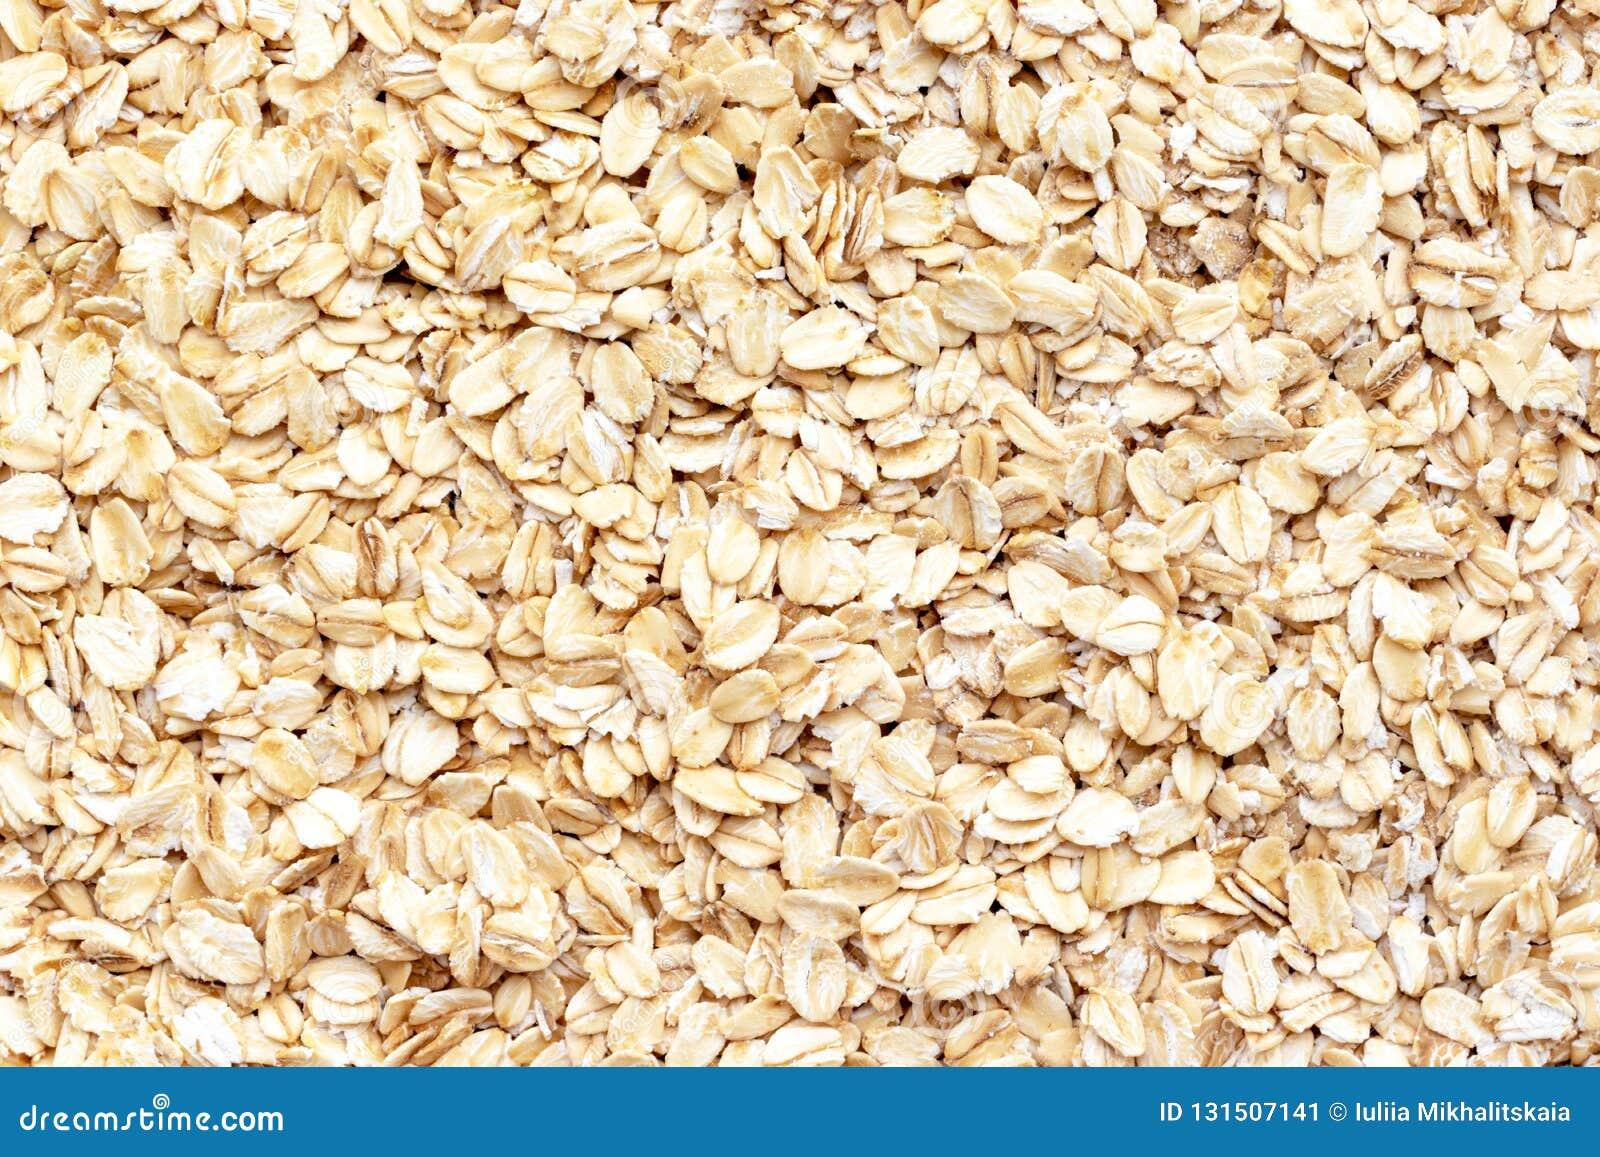 Raw Oat Flakes Texture, Healthy Porridge Background, Copy Space Stock Image